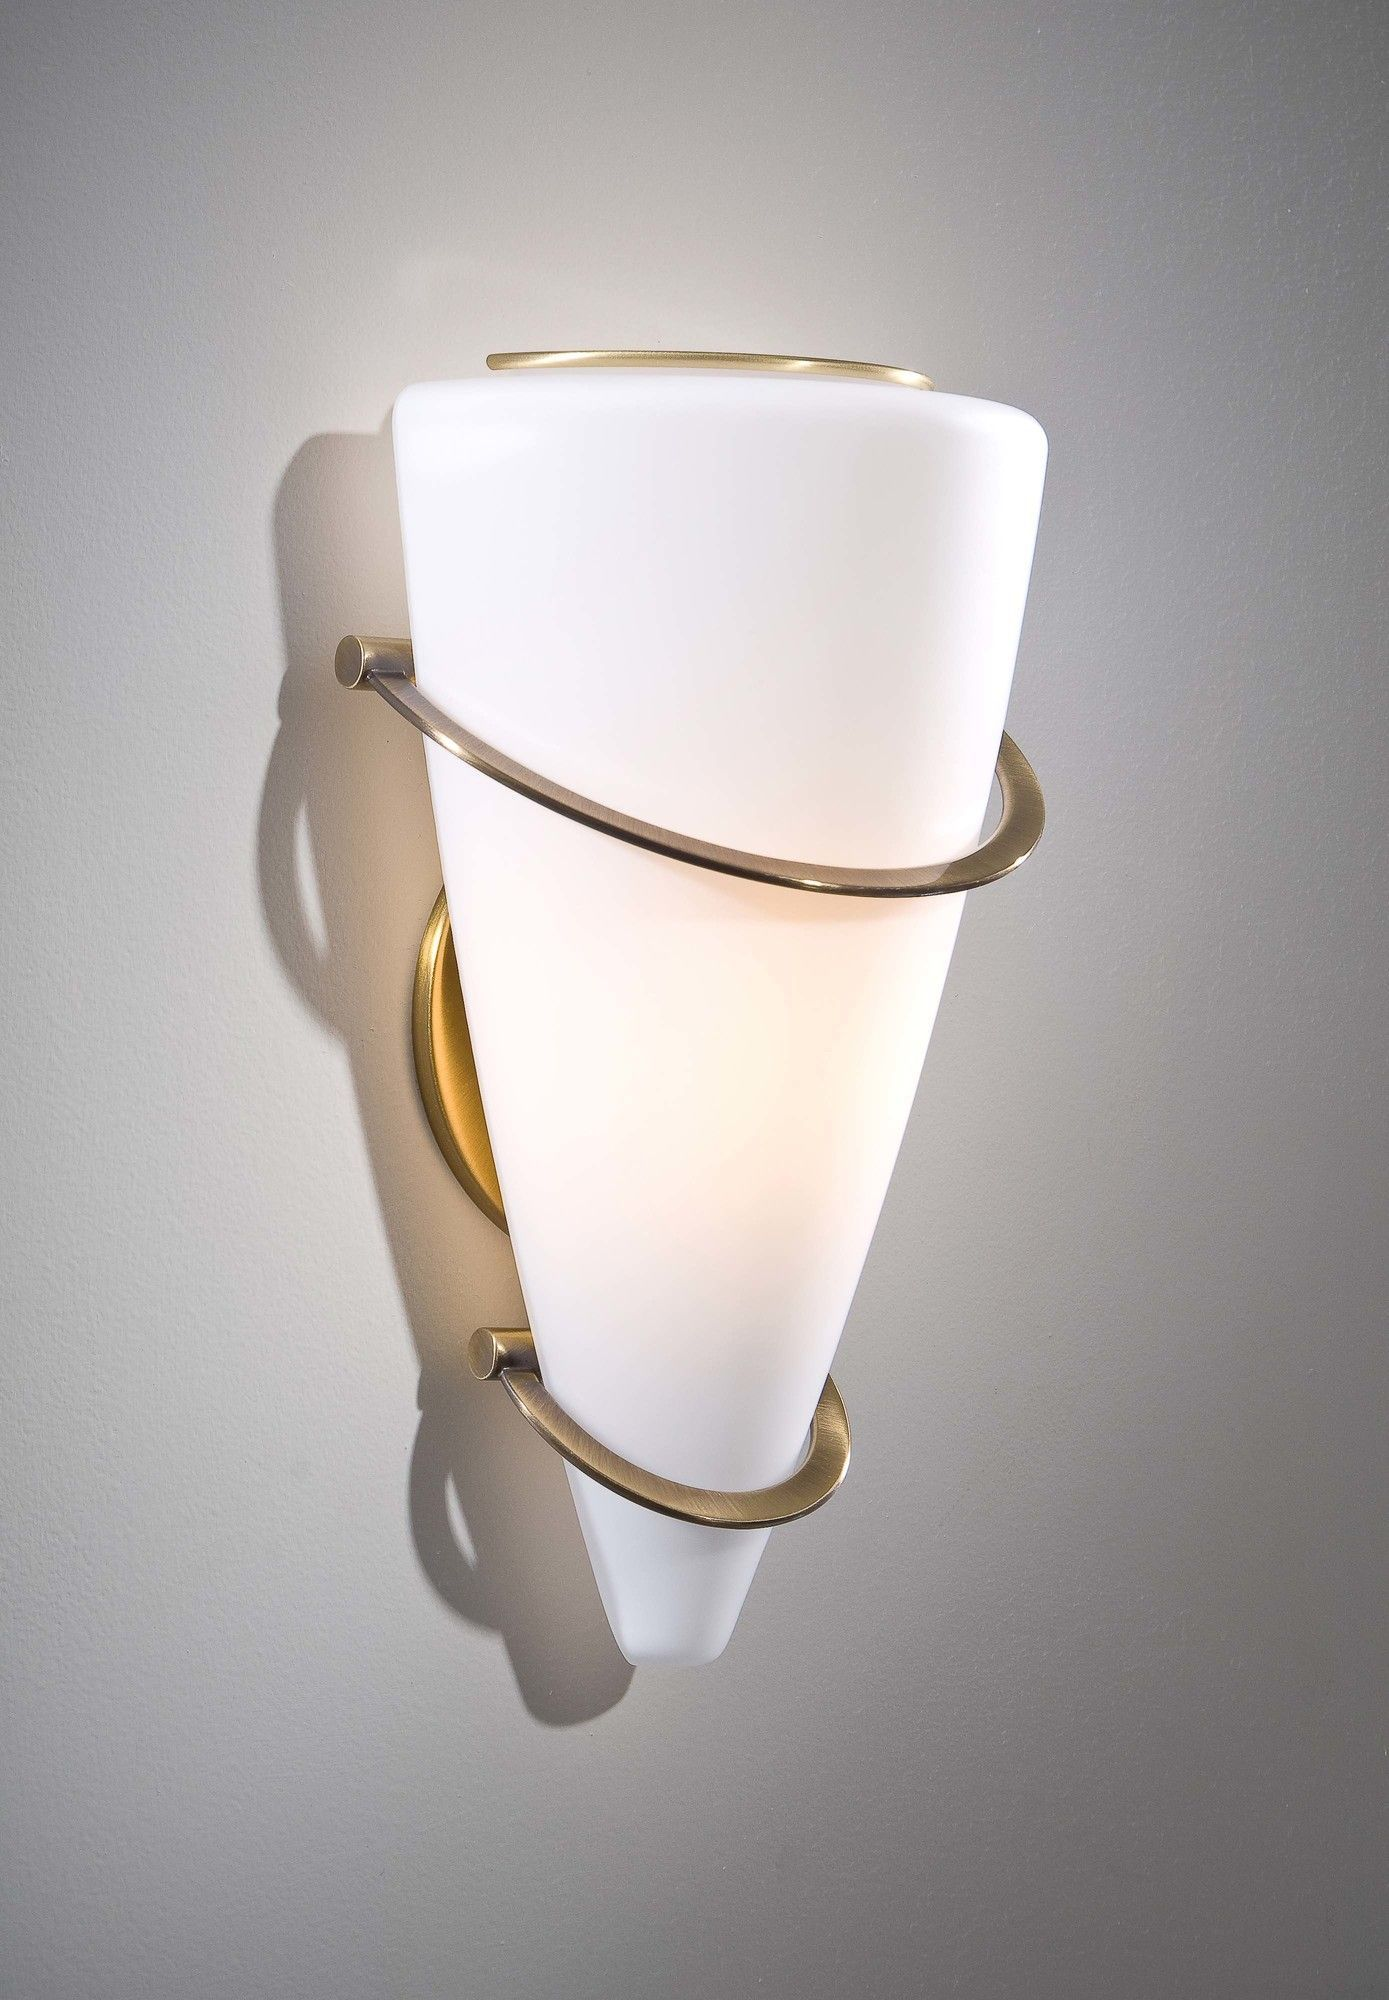 1 Light Wall Sconce Wall Sconce Lighting Wall Lights